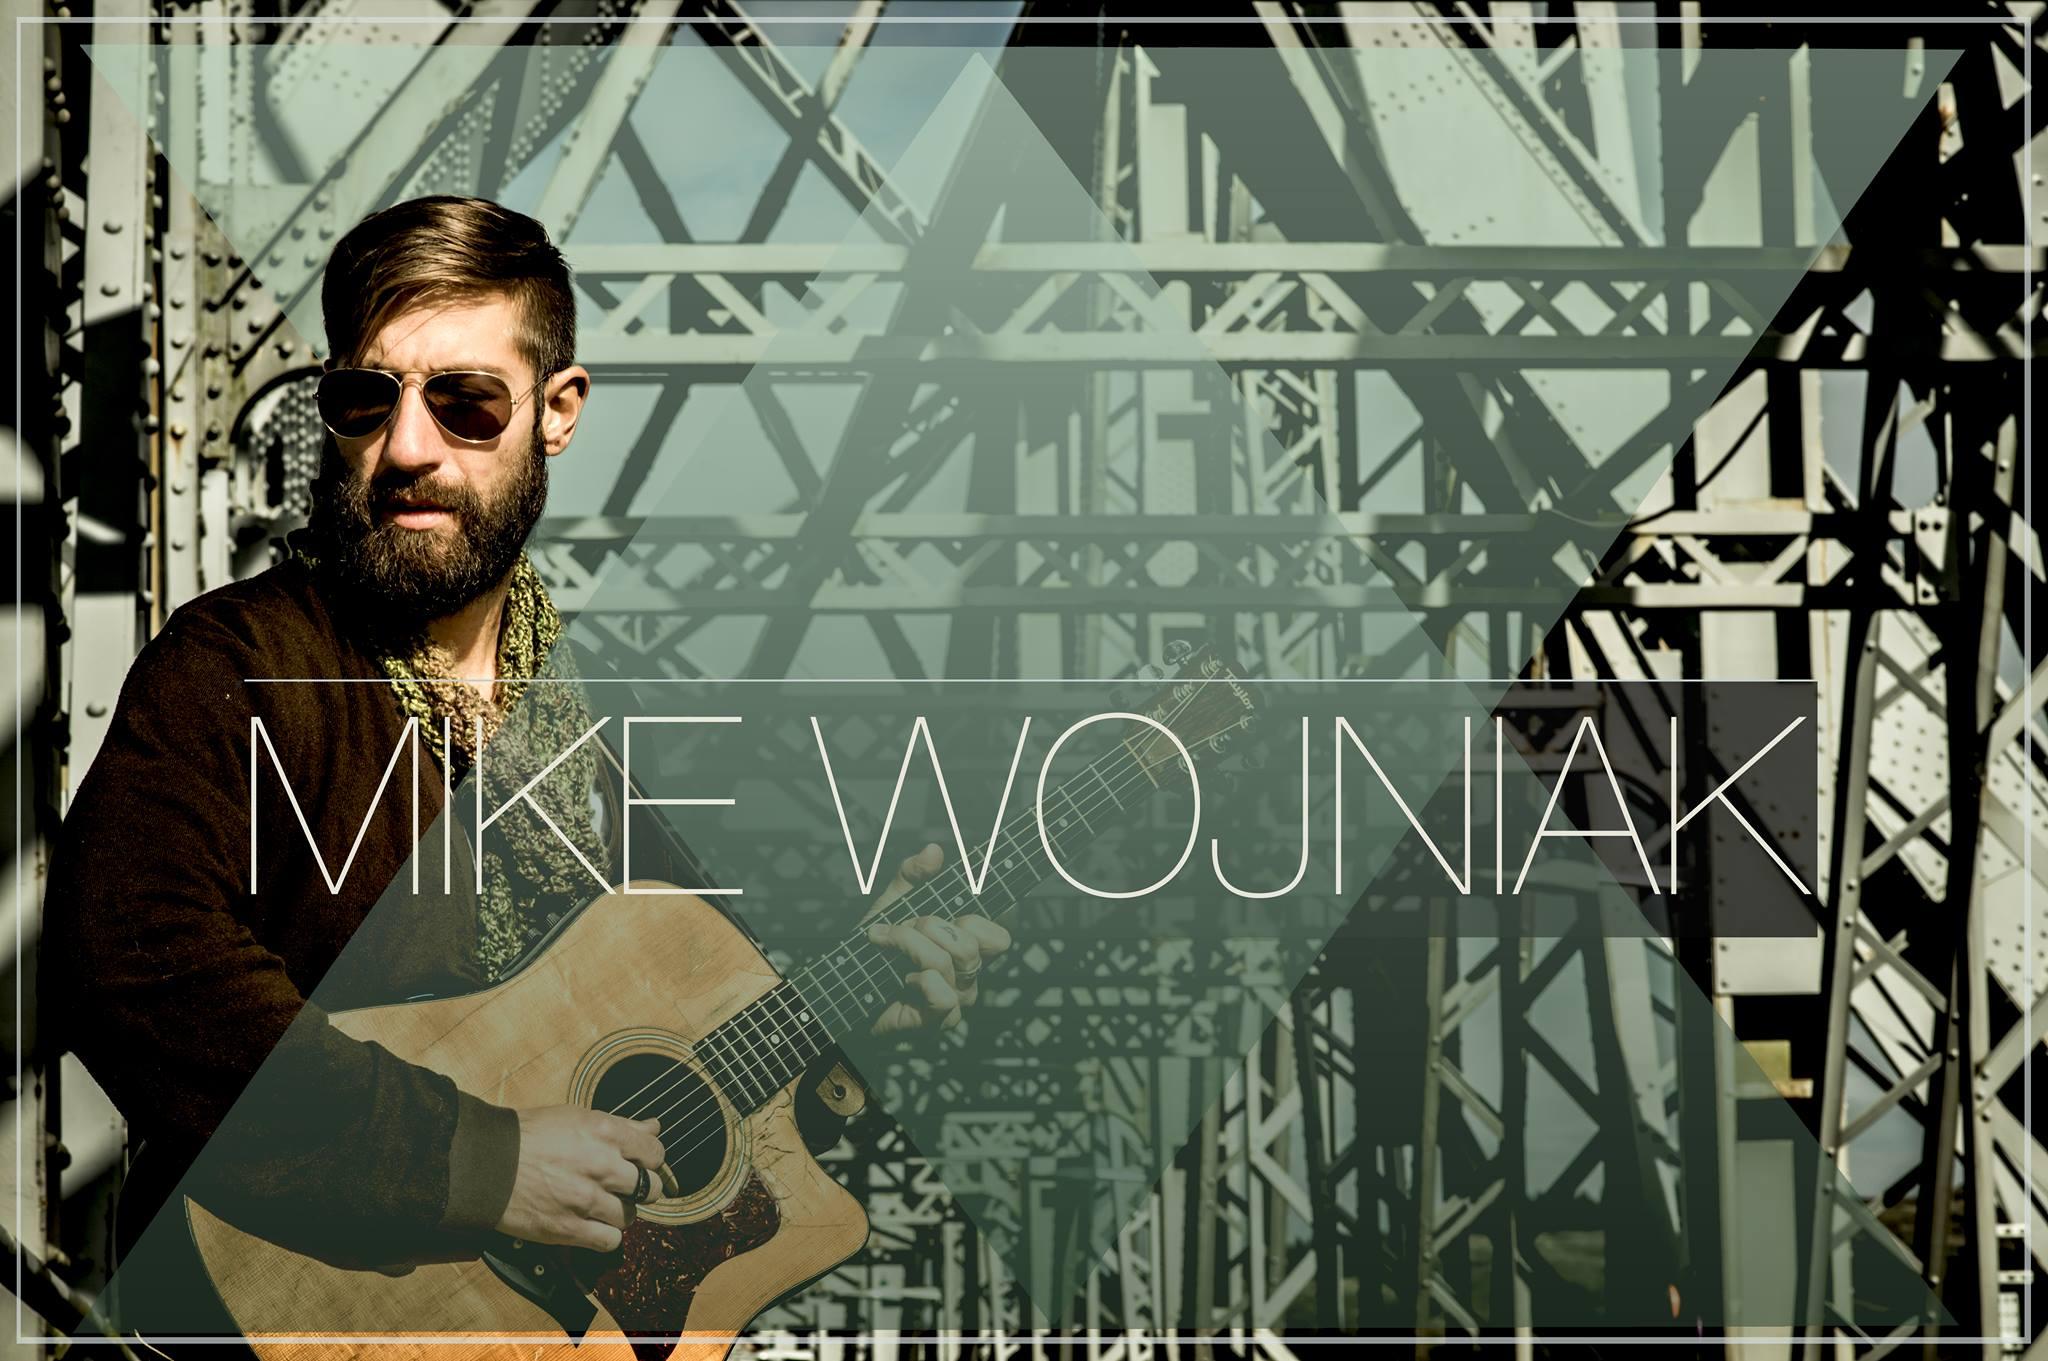 Mike Wojniak with his guitar on a bridge.